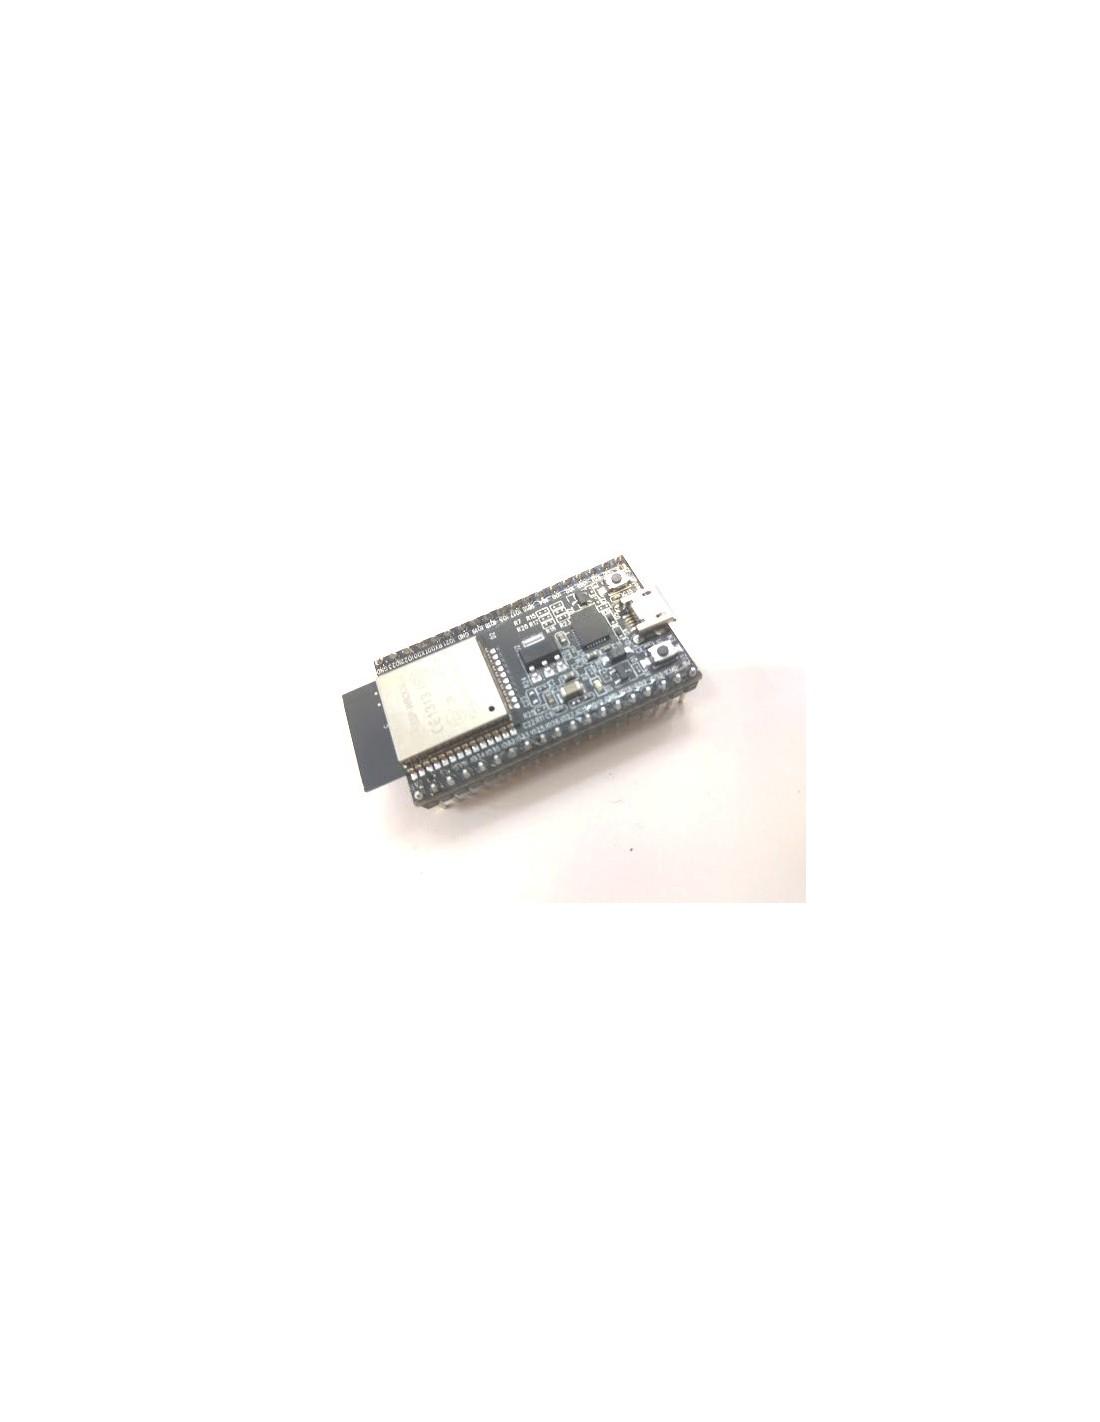 ESP-32-DevKitC NodeMCU-like dev  board for ESP32 (Based on ESP-WROOM-32D,  Wifi and Bluetooth 4 0)